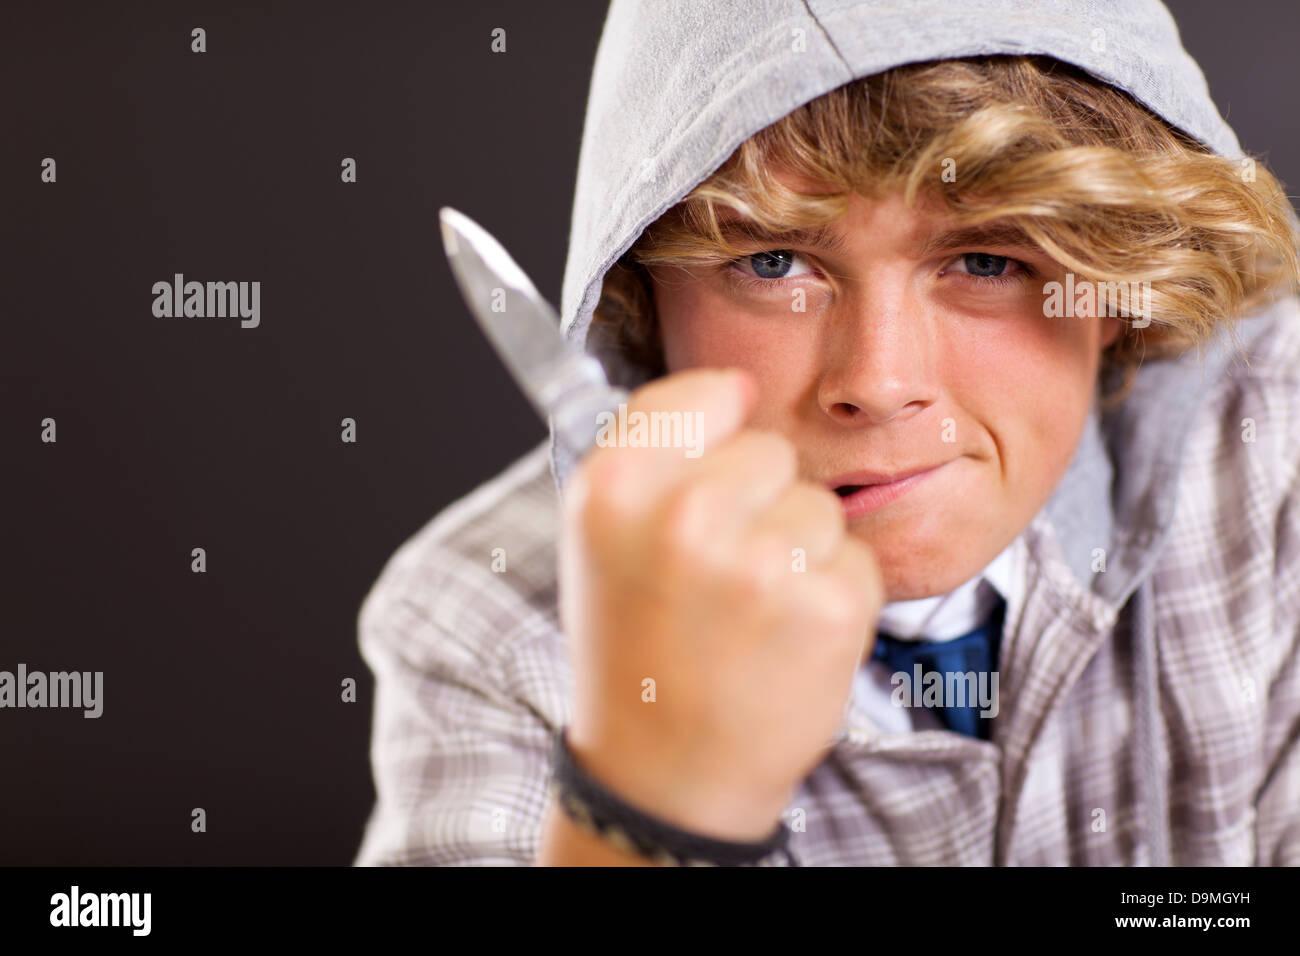 violent teen boy holding a knife - Stock Image